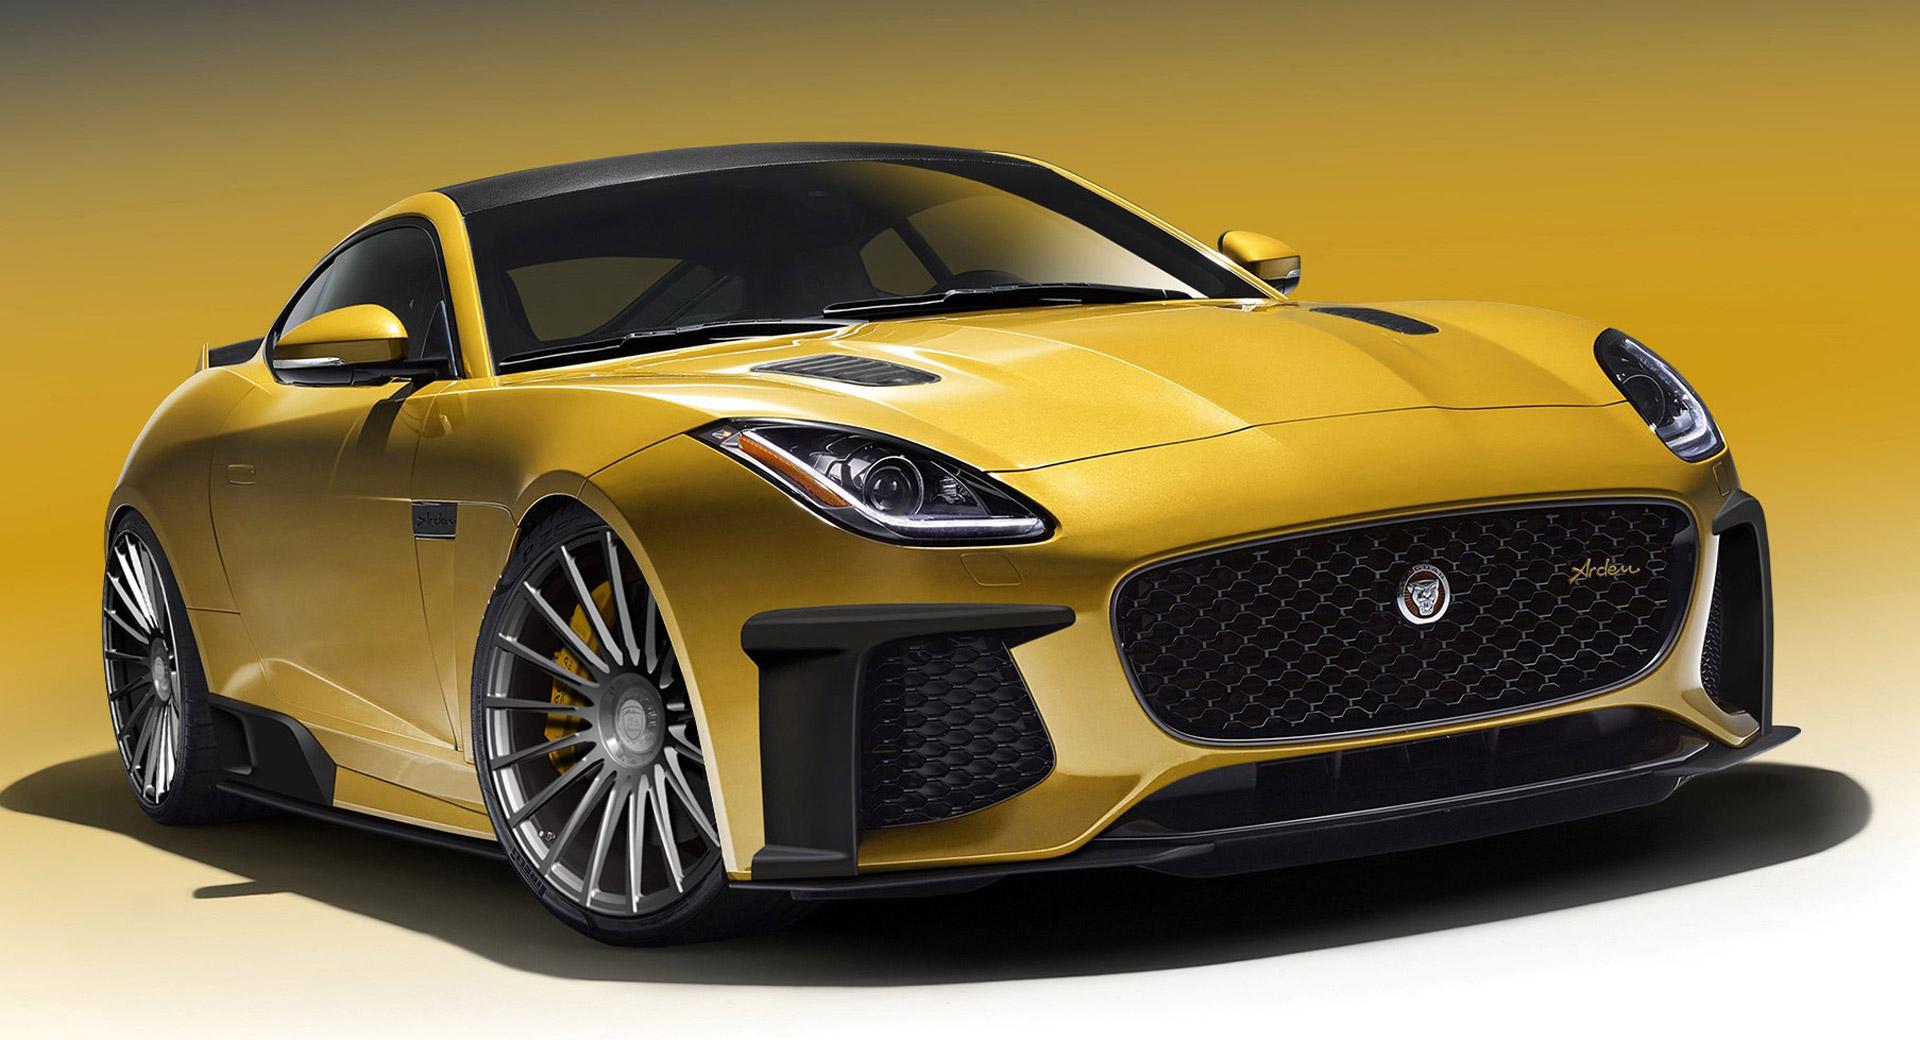 SVR jaguar f type